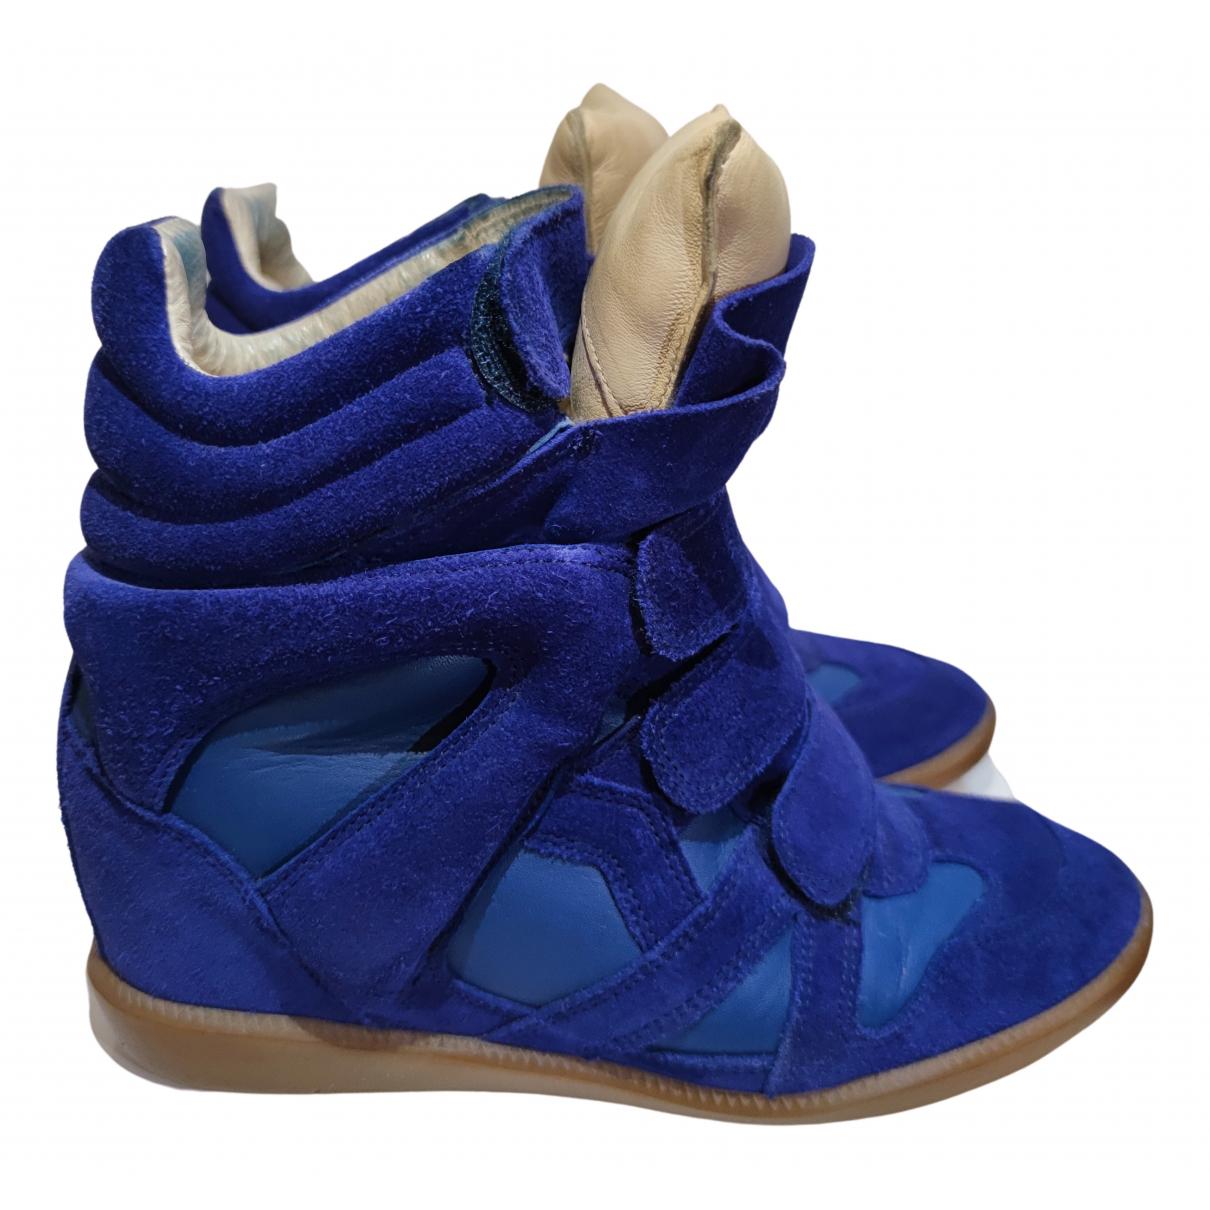 Isabel Marant - Baskets Beckett pour femme en suede - bleu